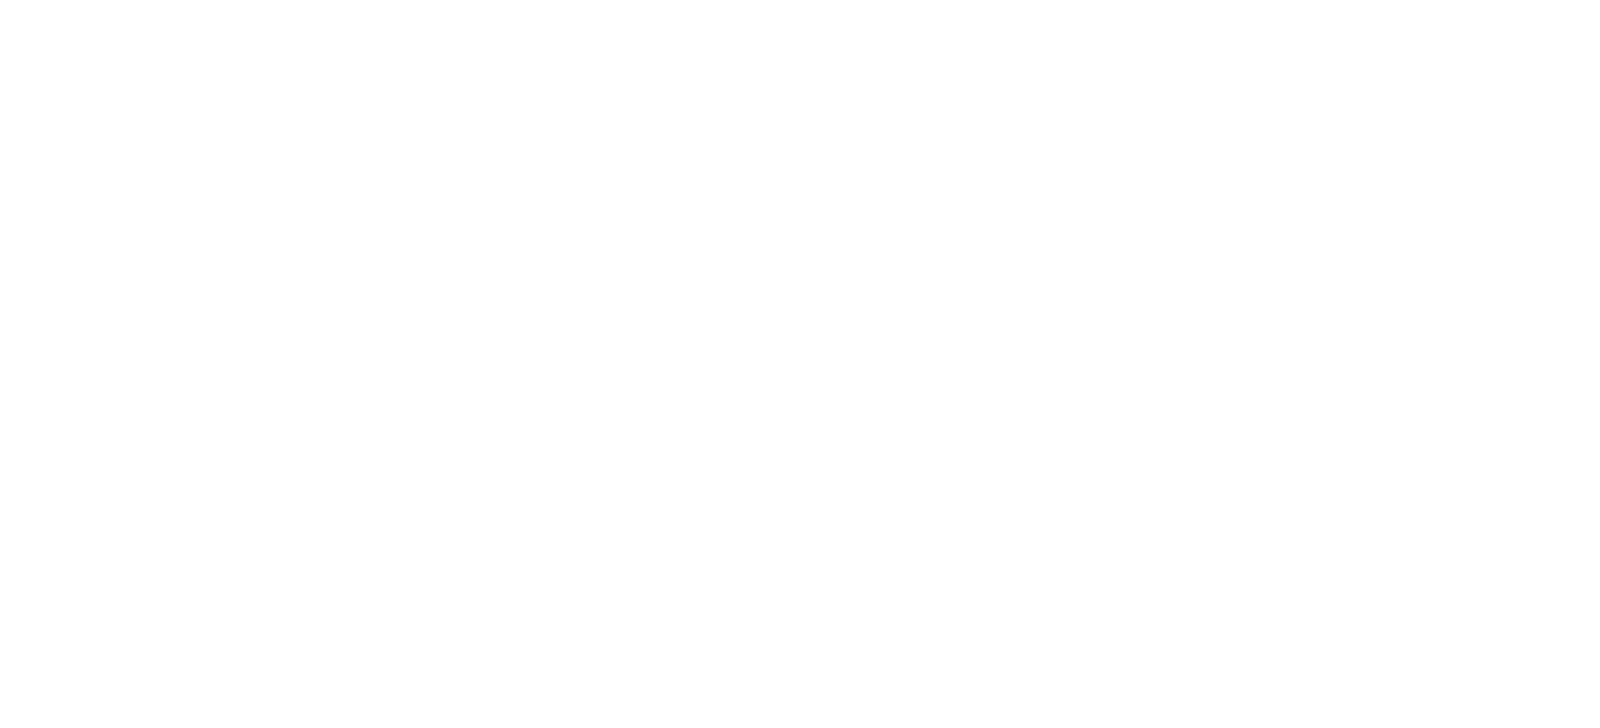 Aren & Kristina